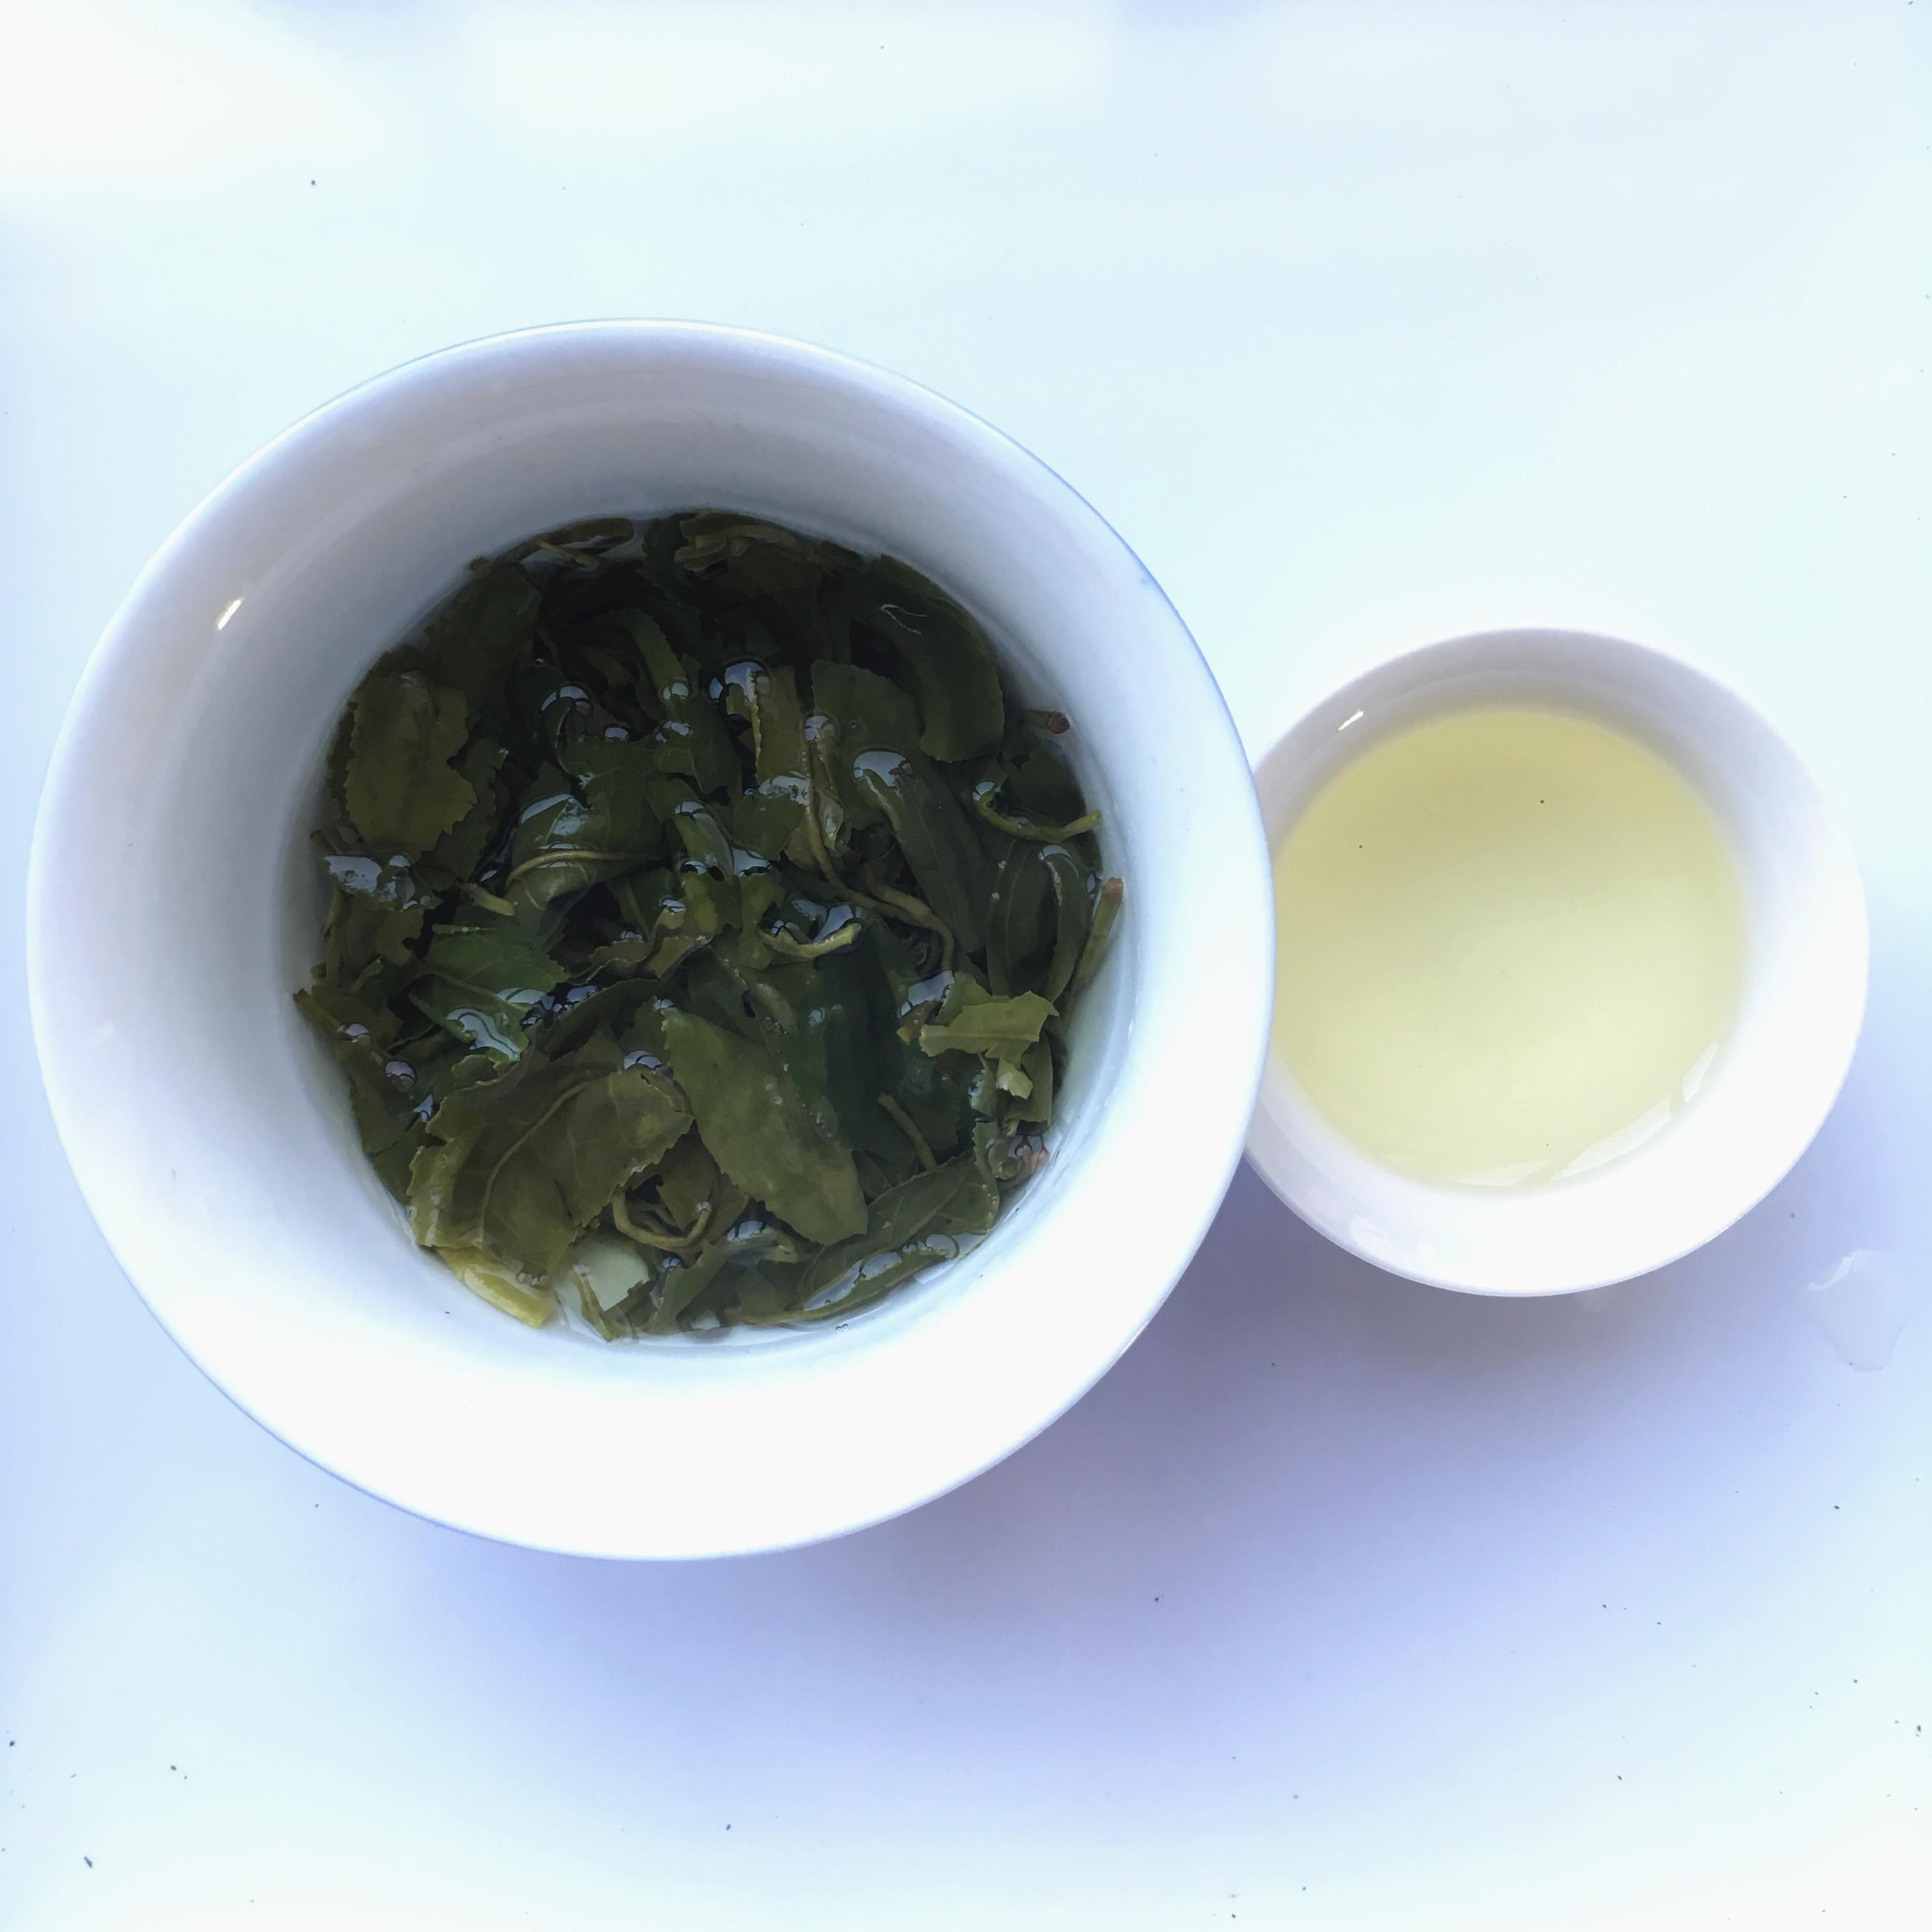 Fresh Organic Green Tea Leaves Blended Loose Tea - 4uTea | 4uTea.com